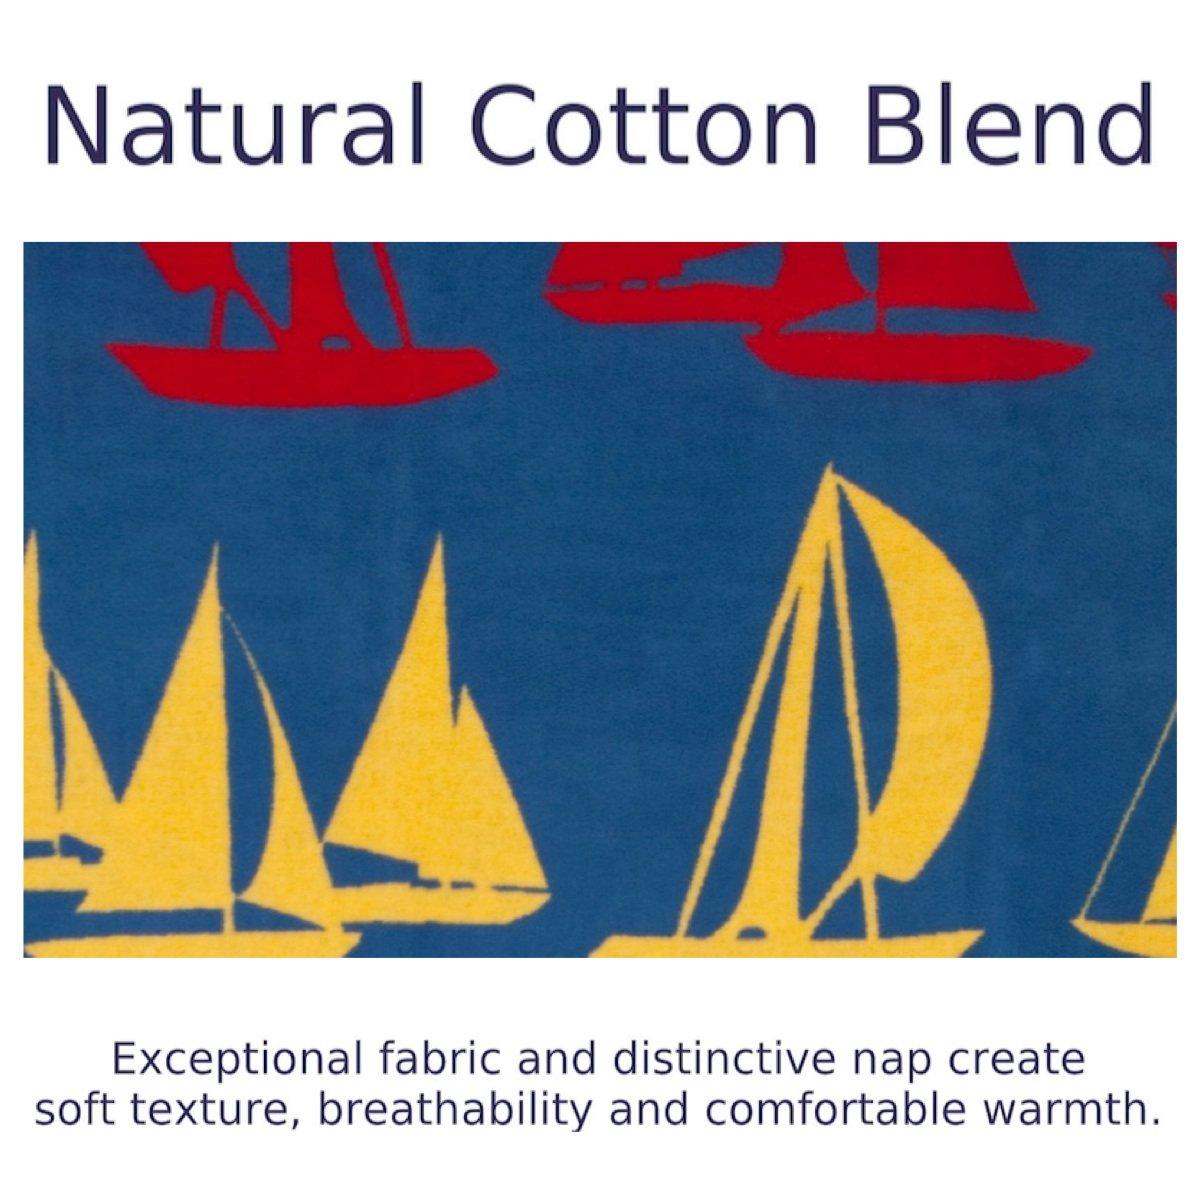 ChappyWrap Oversize Cotton Throw Blanket - Coastal Living Collection by ChappyWrap (Image #4)